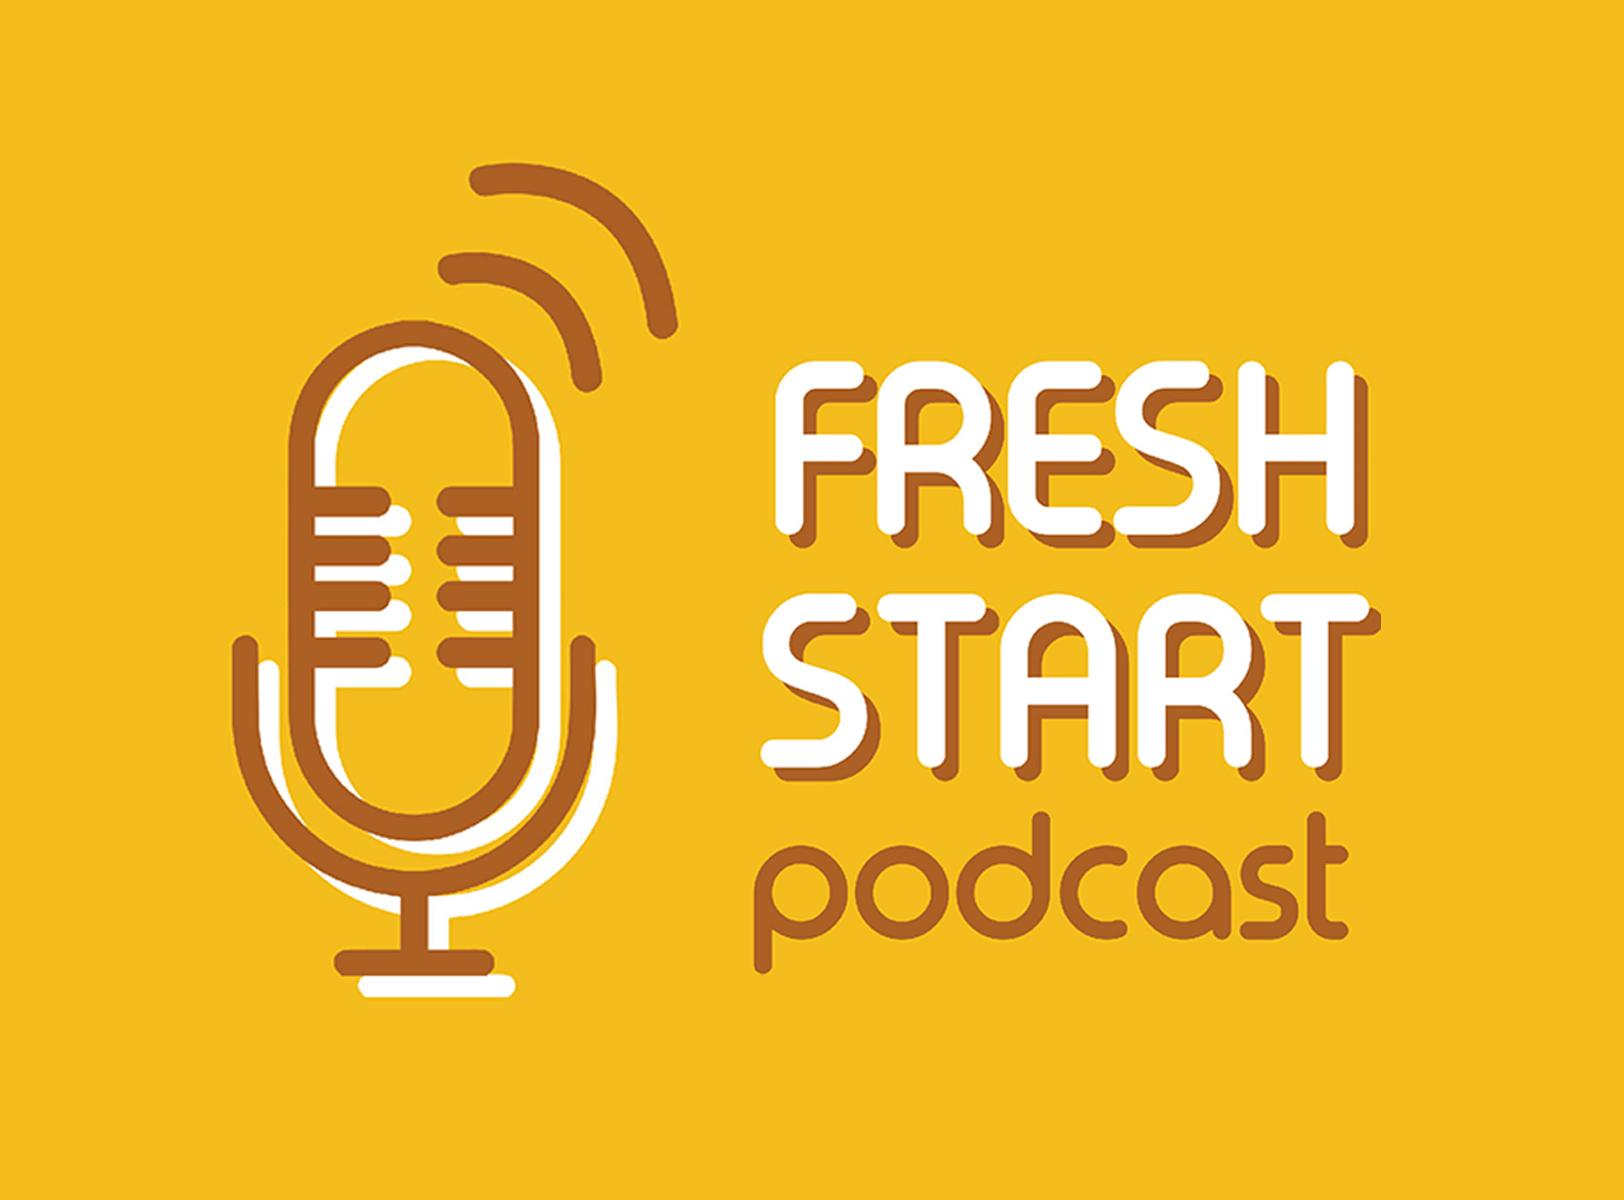 Fresh Start: Podcast News (8/6/2019 Tue.)